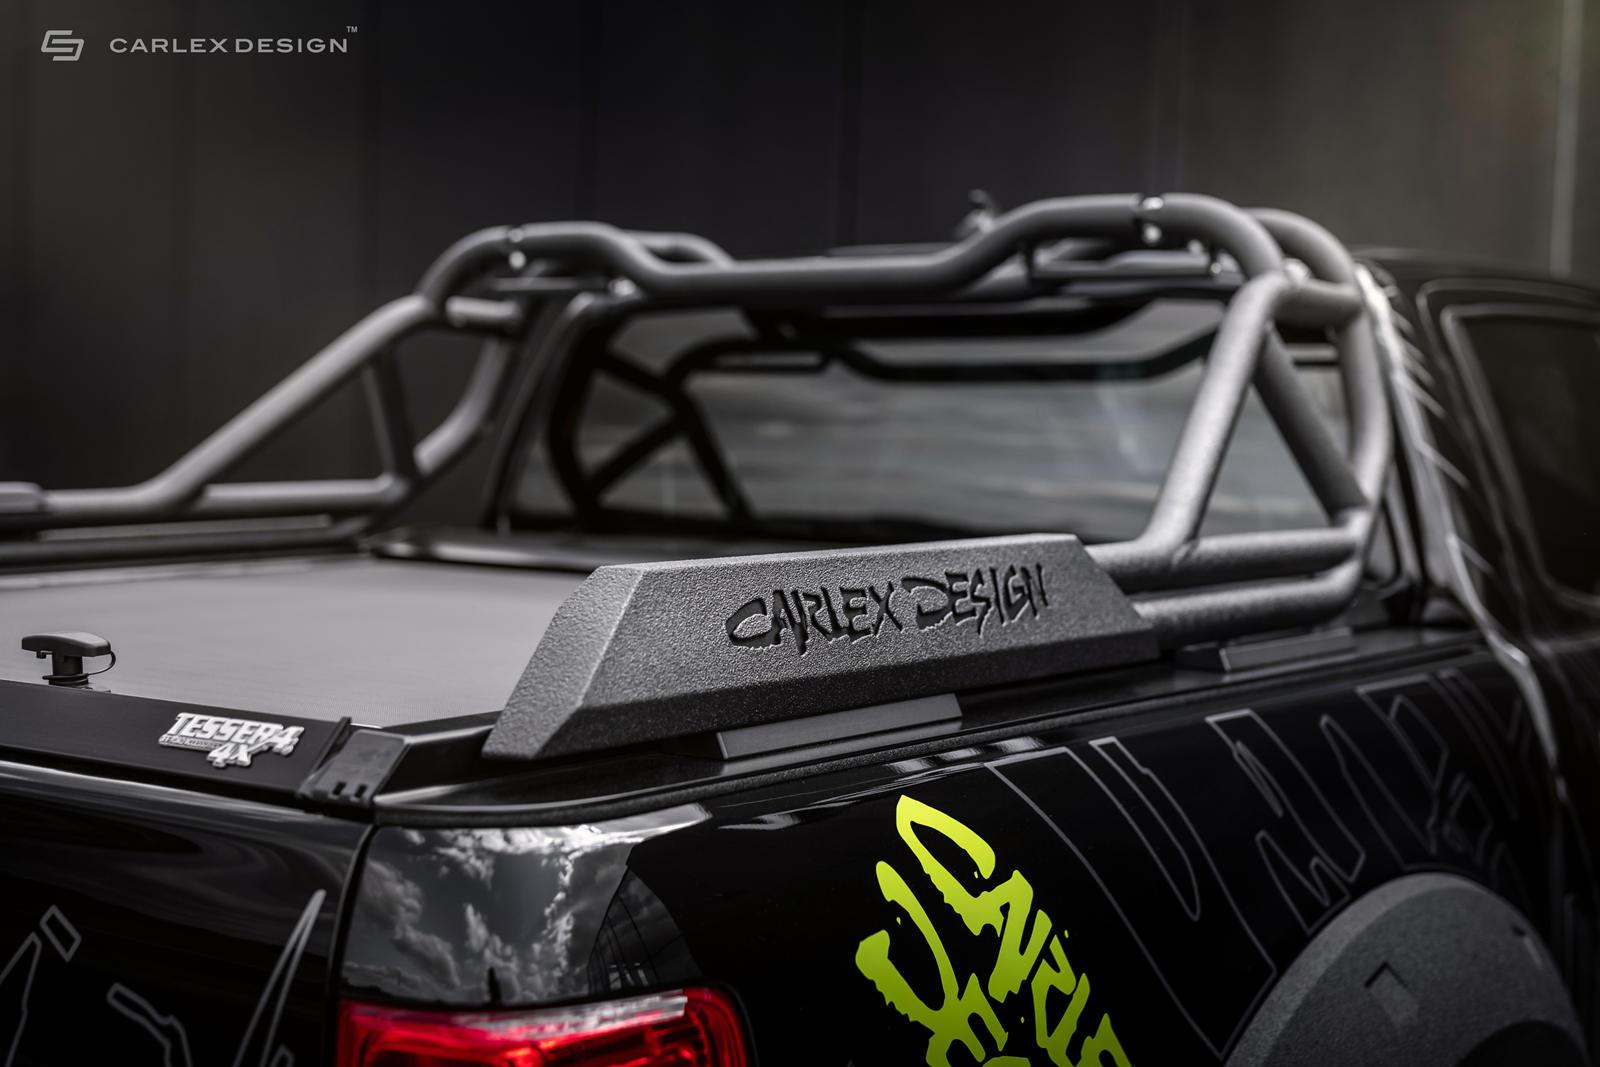 Ford_Ranger_Carlex_Design_0004